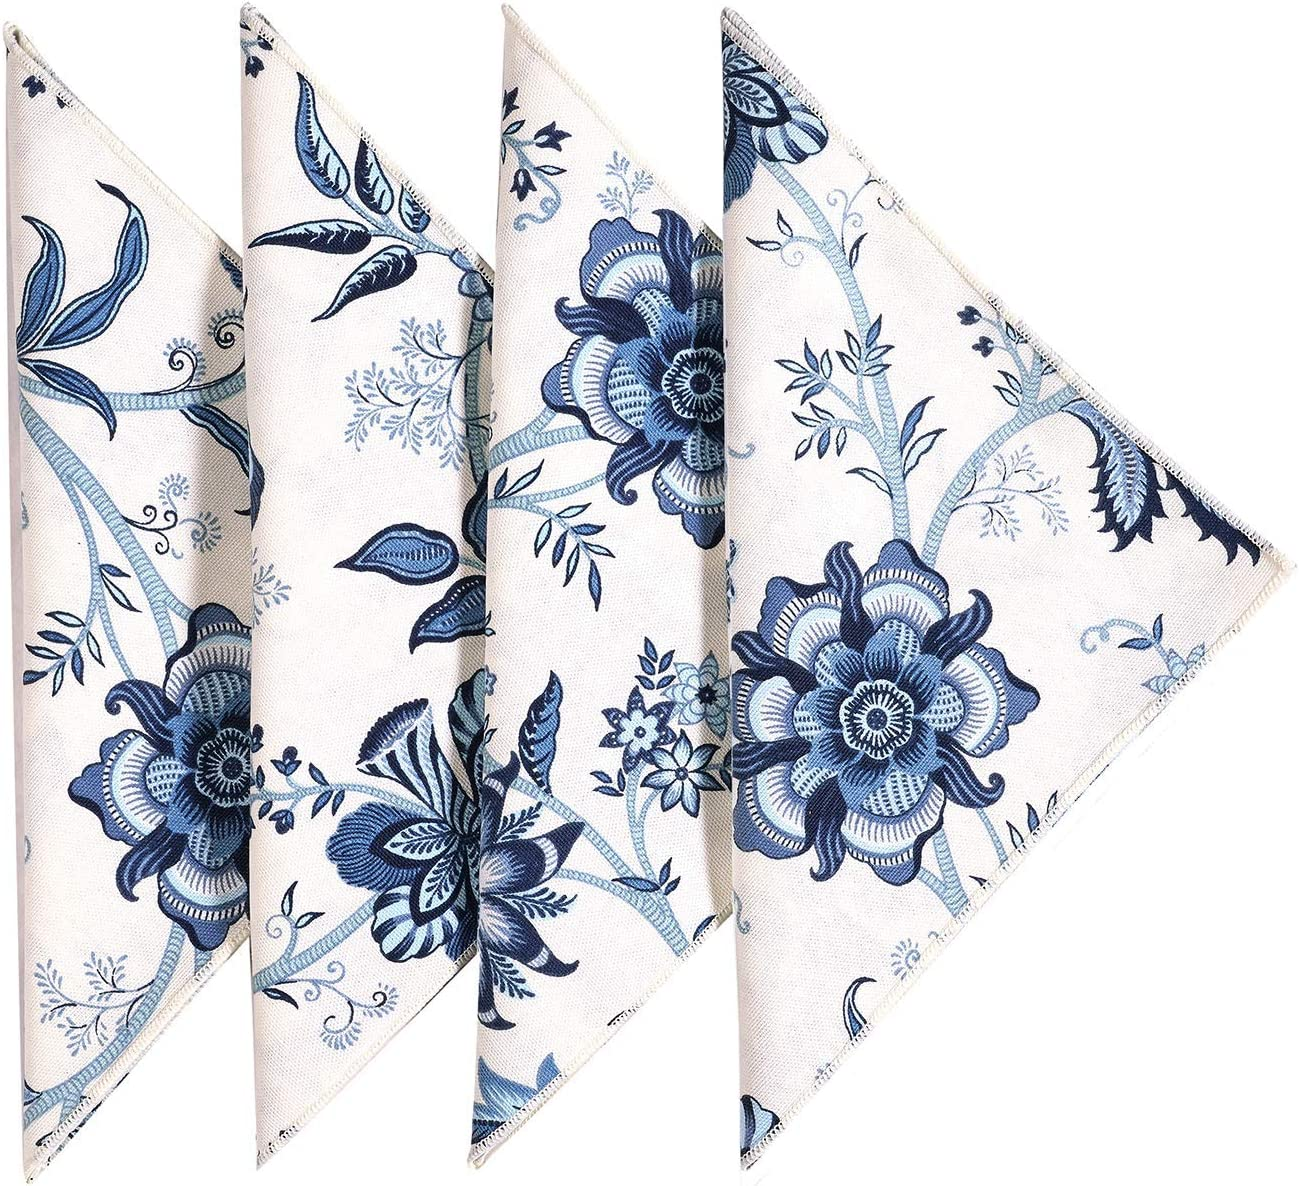 Amazon Com Cloth Napkins Table Linens Dinner Napkins 18 X18 White Blue Cotton Floral Fabric Set Of 12 Kitchen Dining